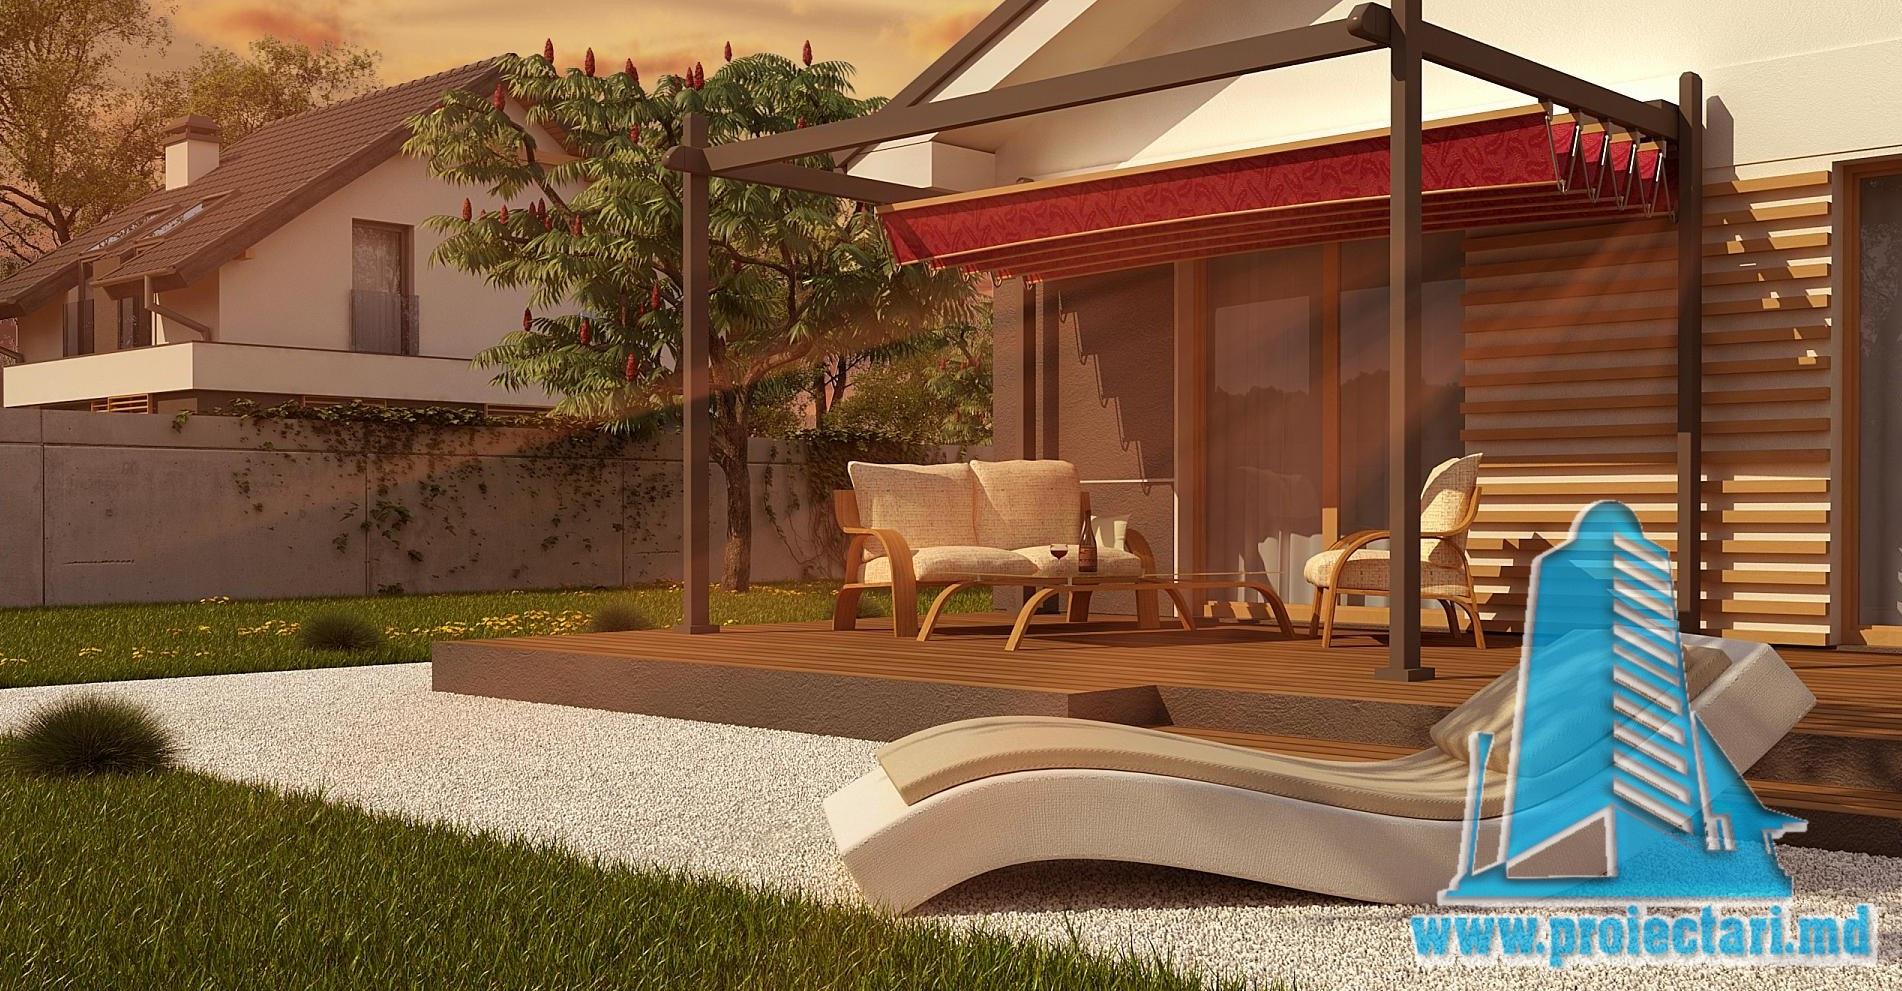 Proiect de casa cu parter si acoperis in panta din tigla ceramica-111m2-100979